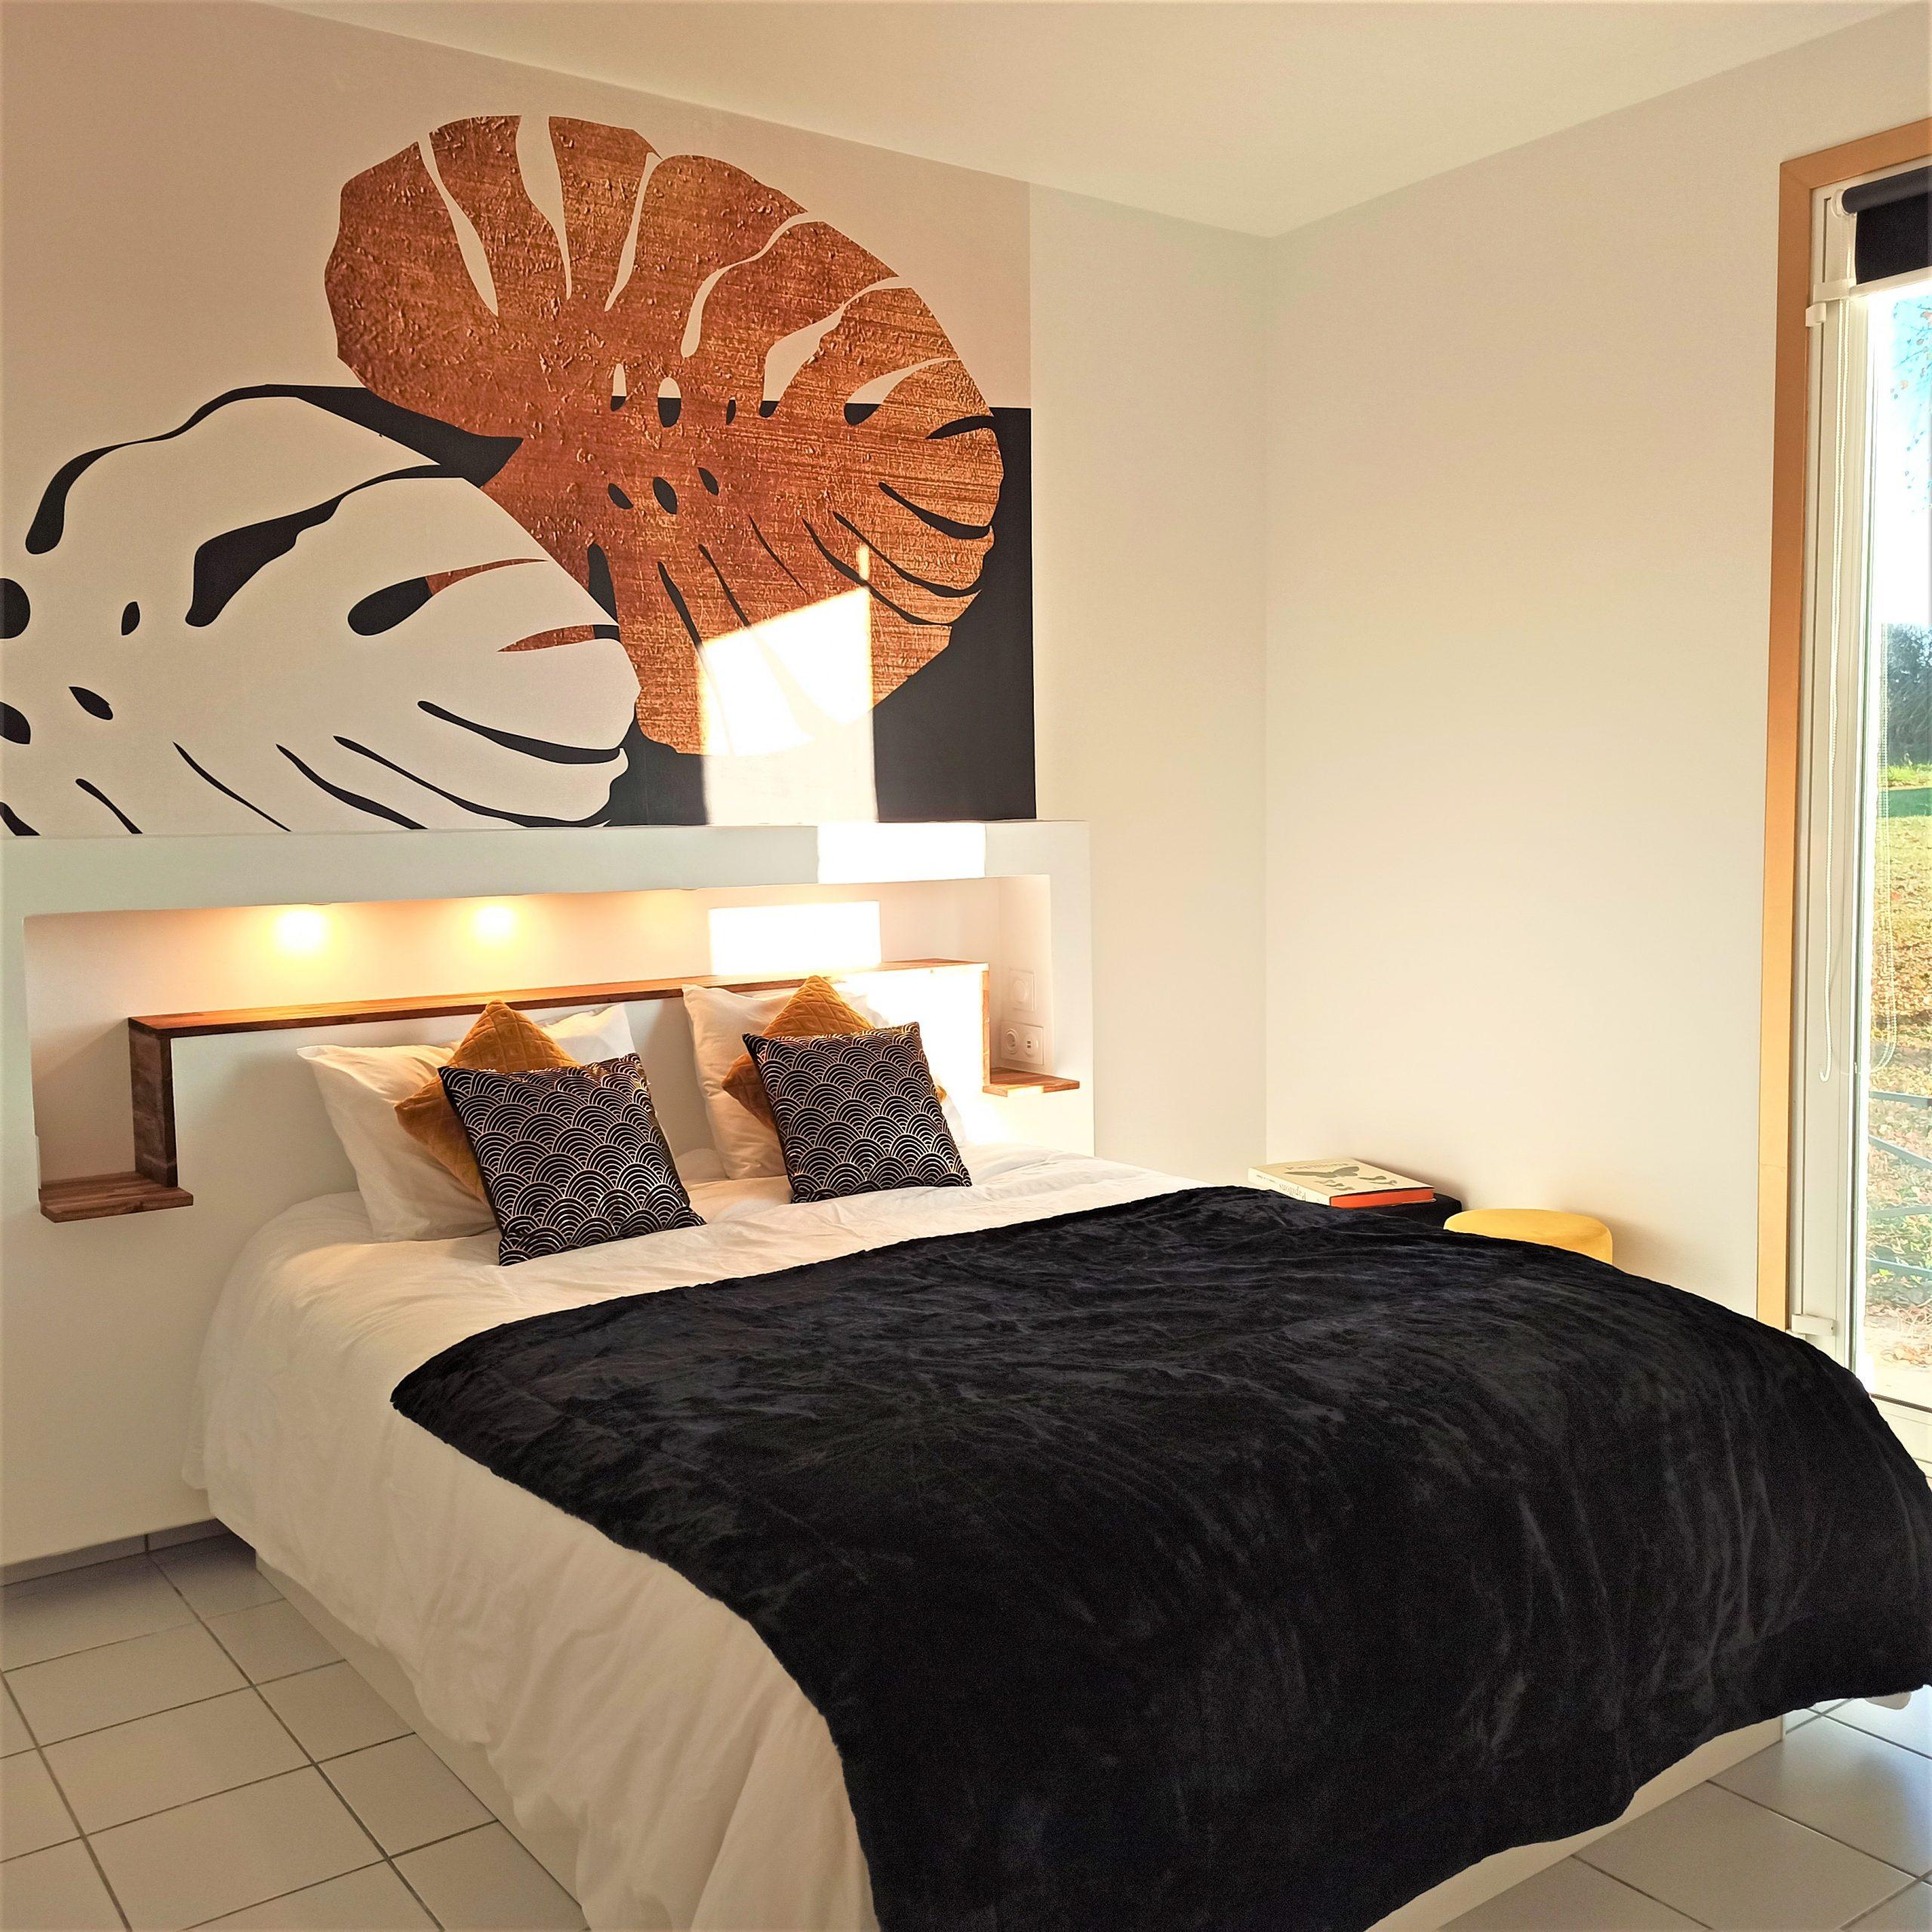 Chambres d hôtes modernes - Futuroscope - Poitiers